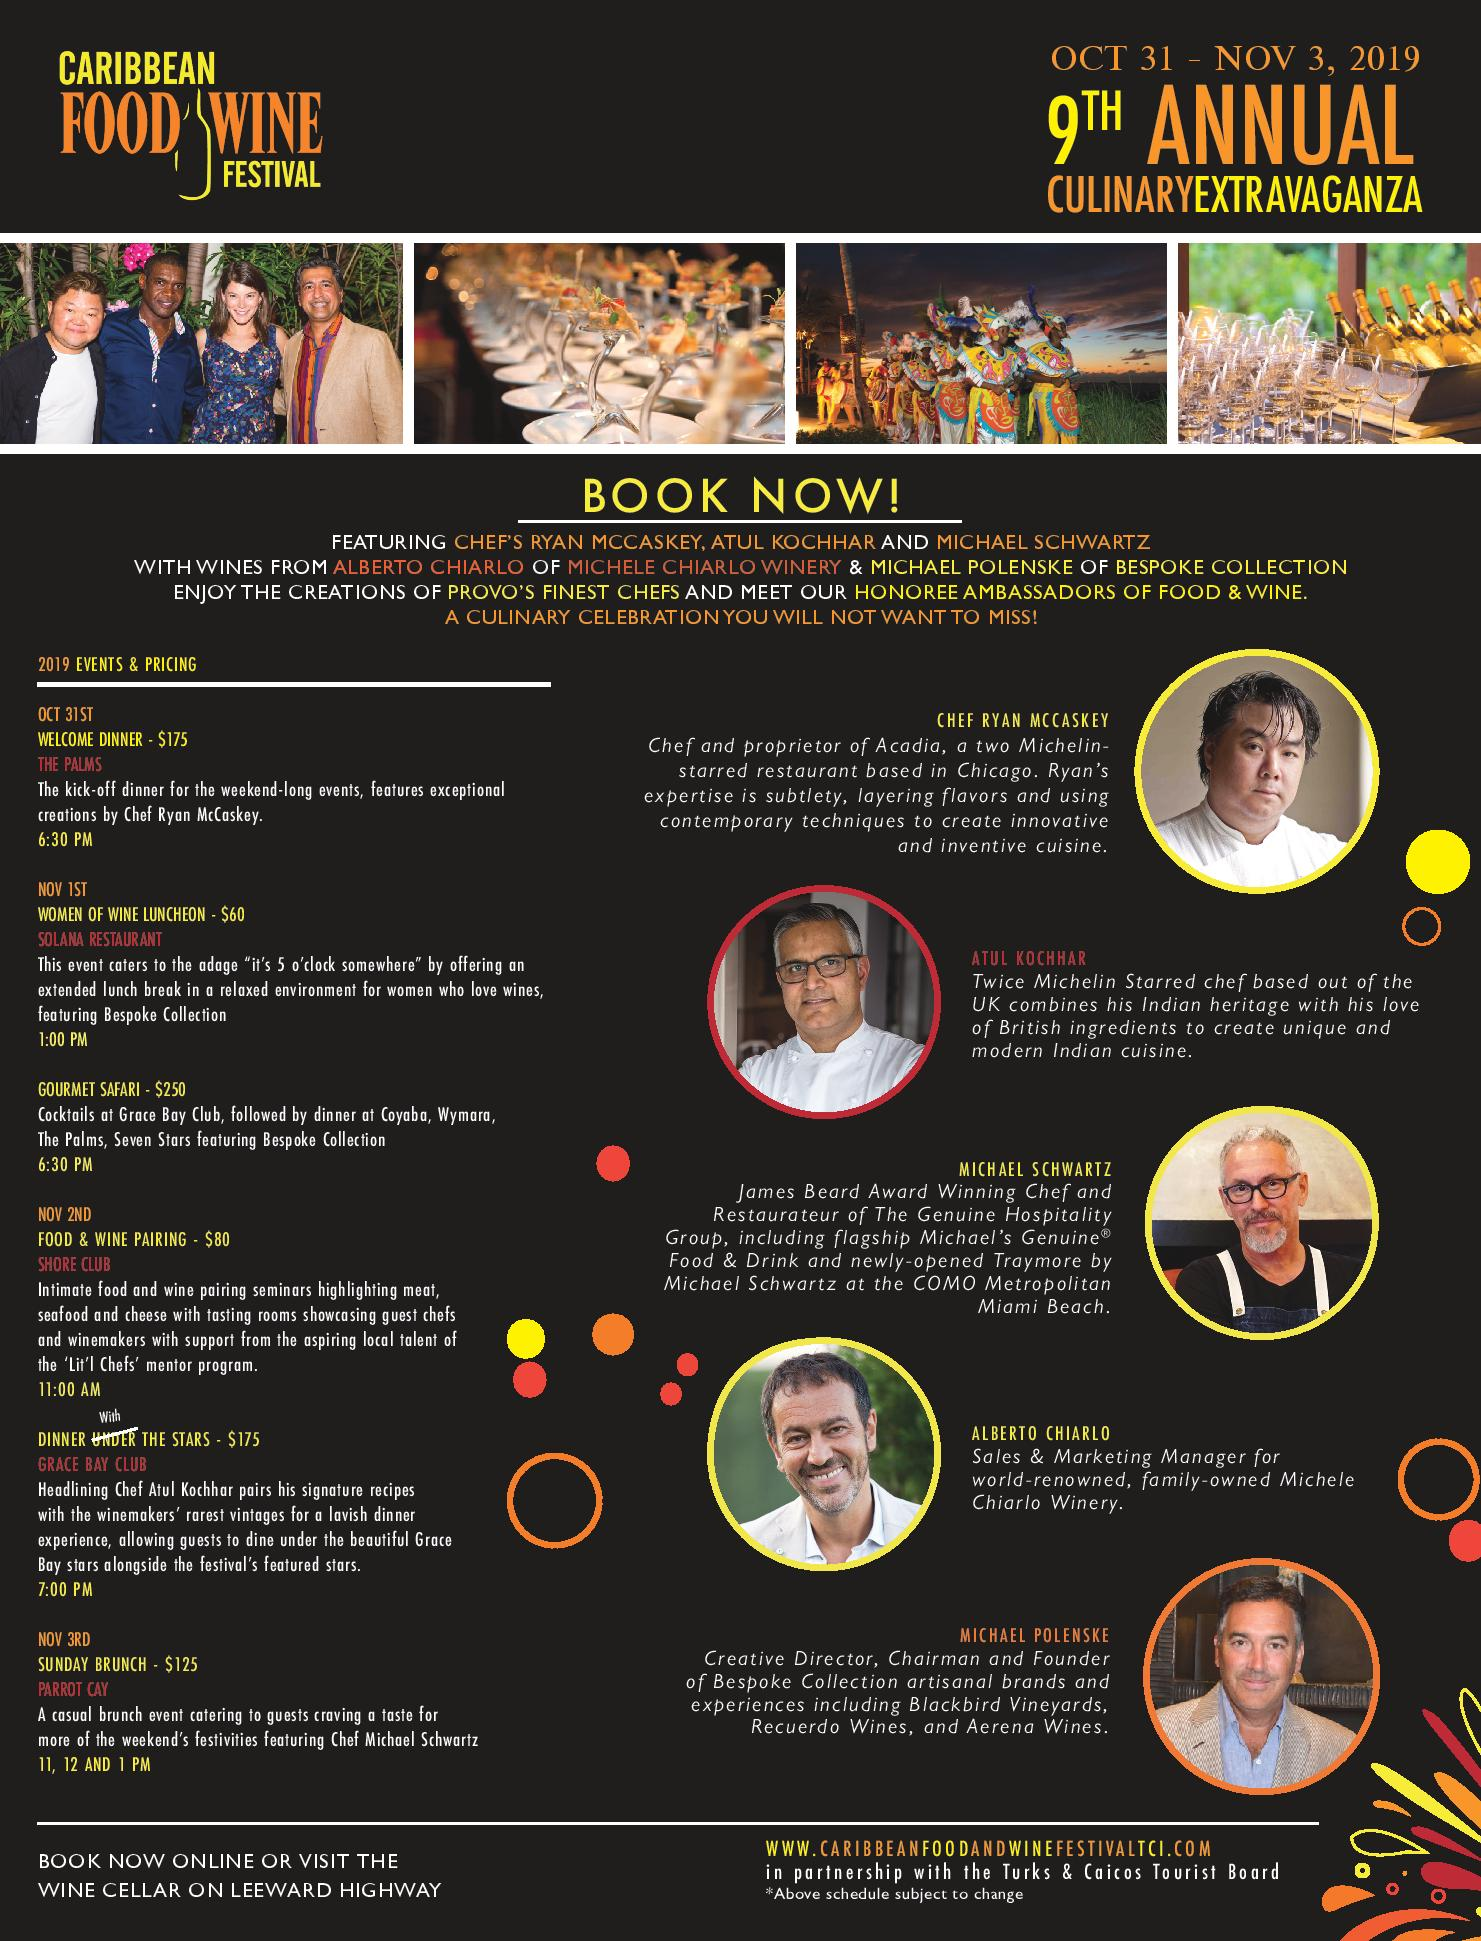 Caribbean Food & Wine Festival 2019 - Food & Pairing